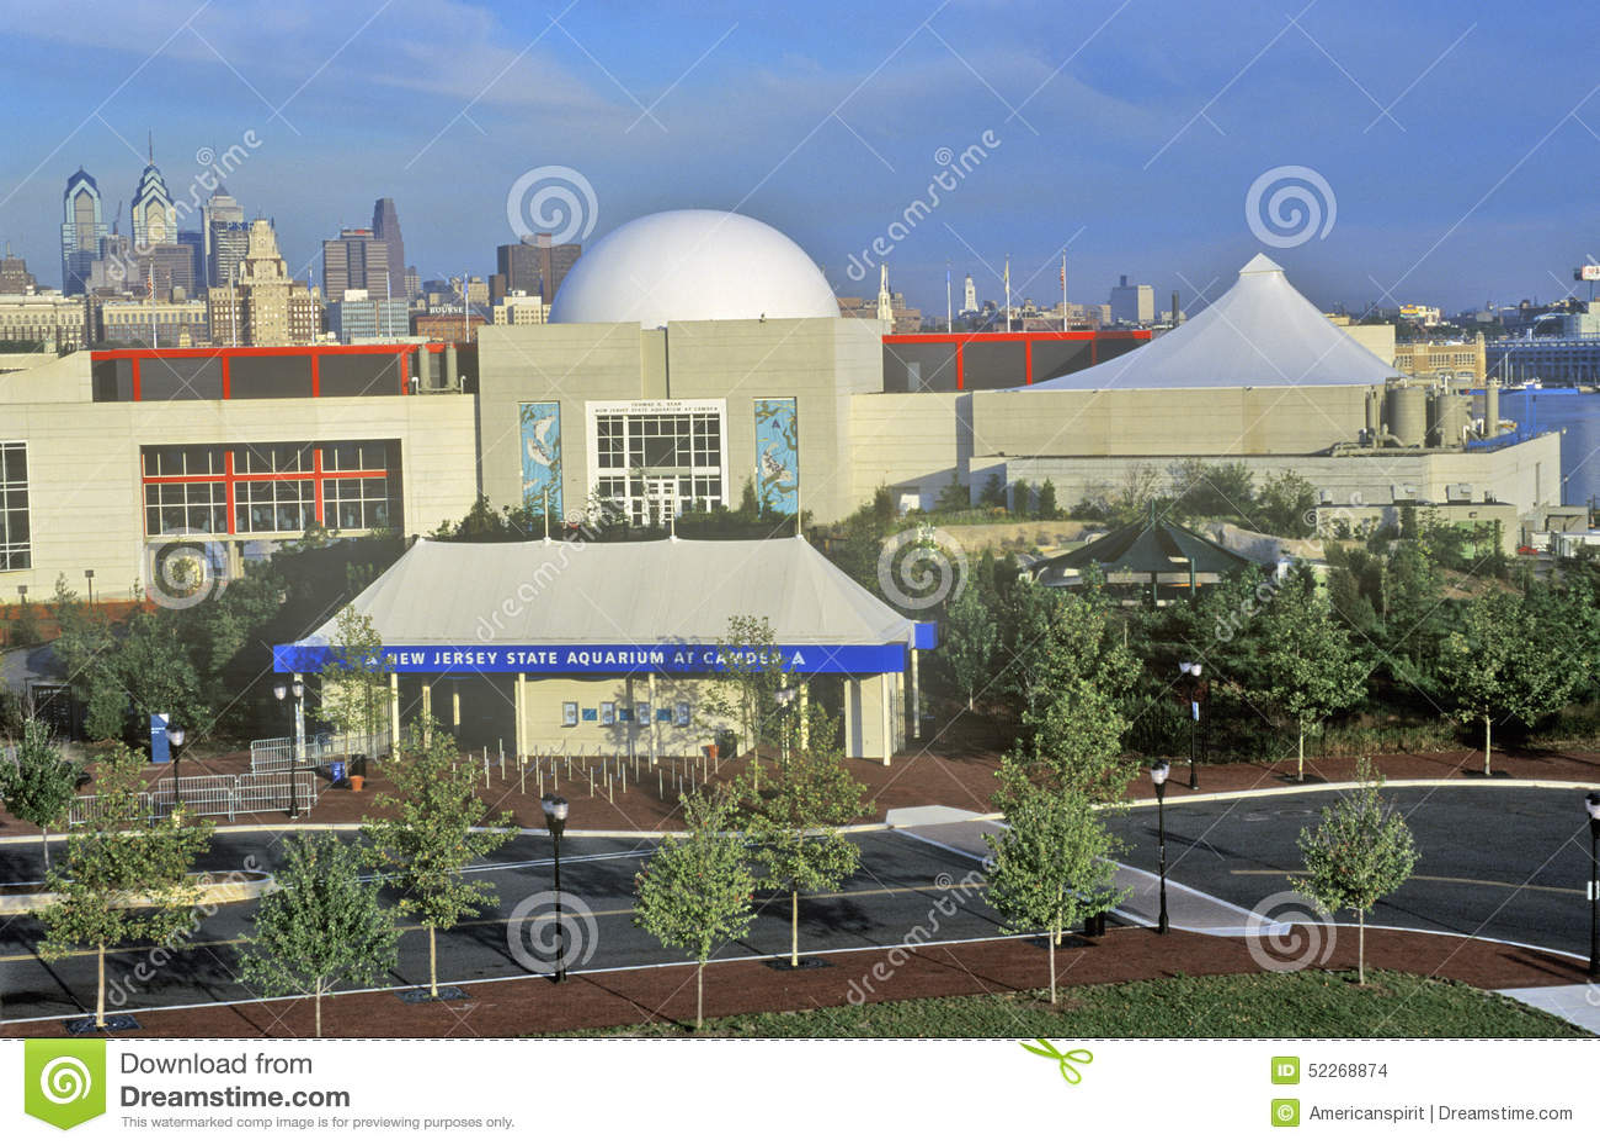 New Jersey State Aquarium In Camden Nj With Philadelphia